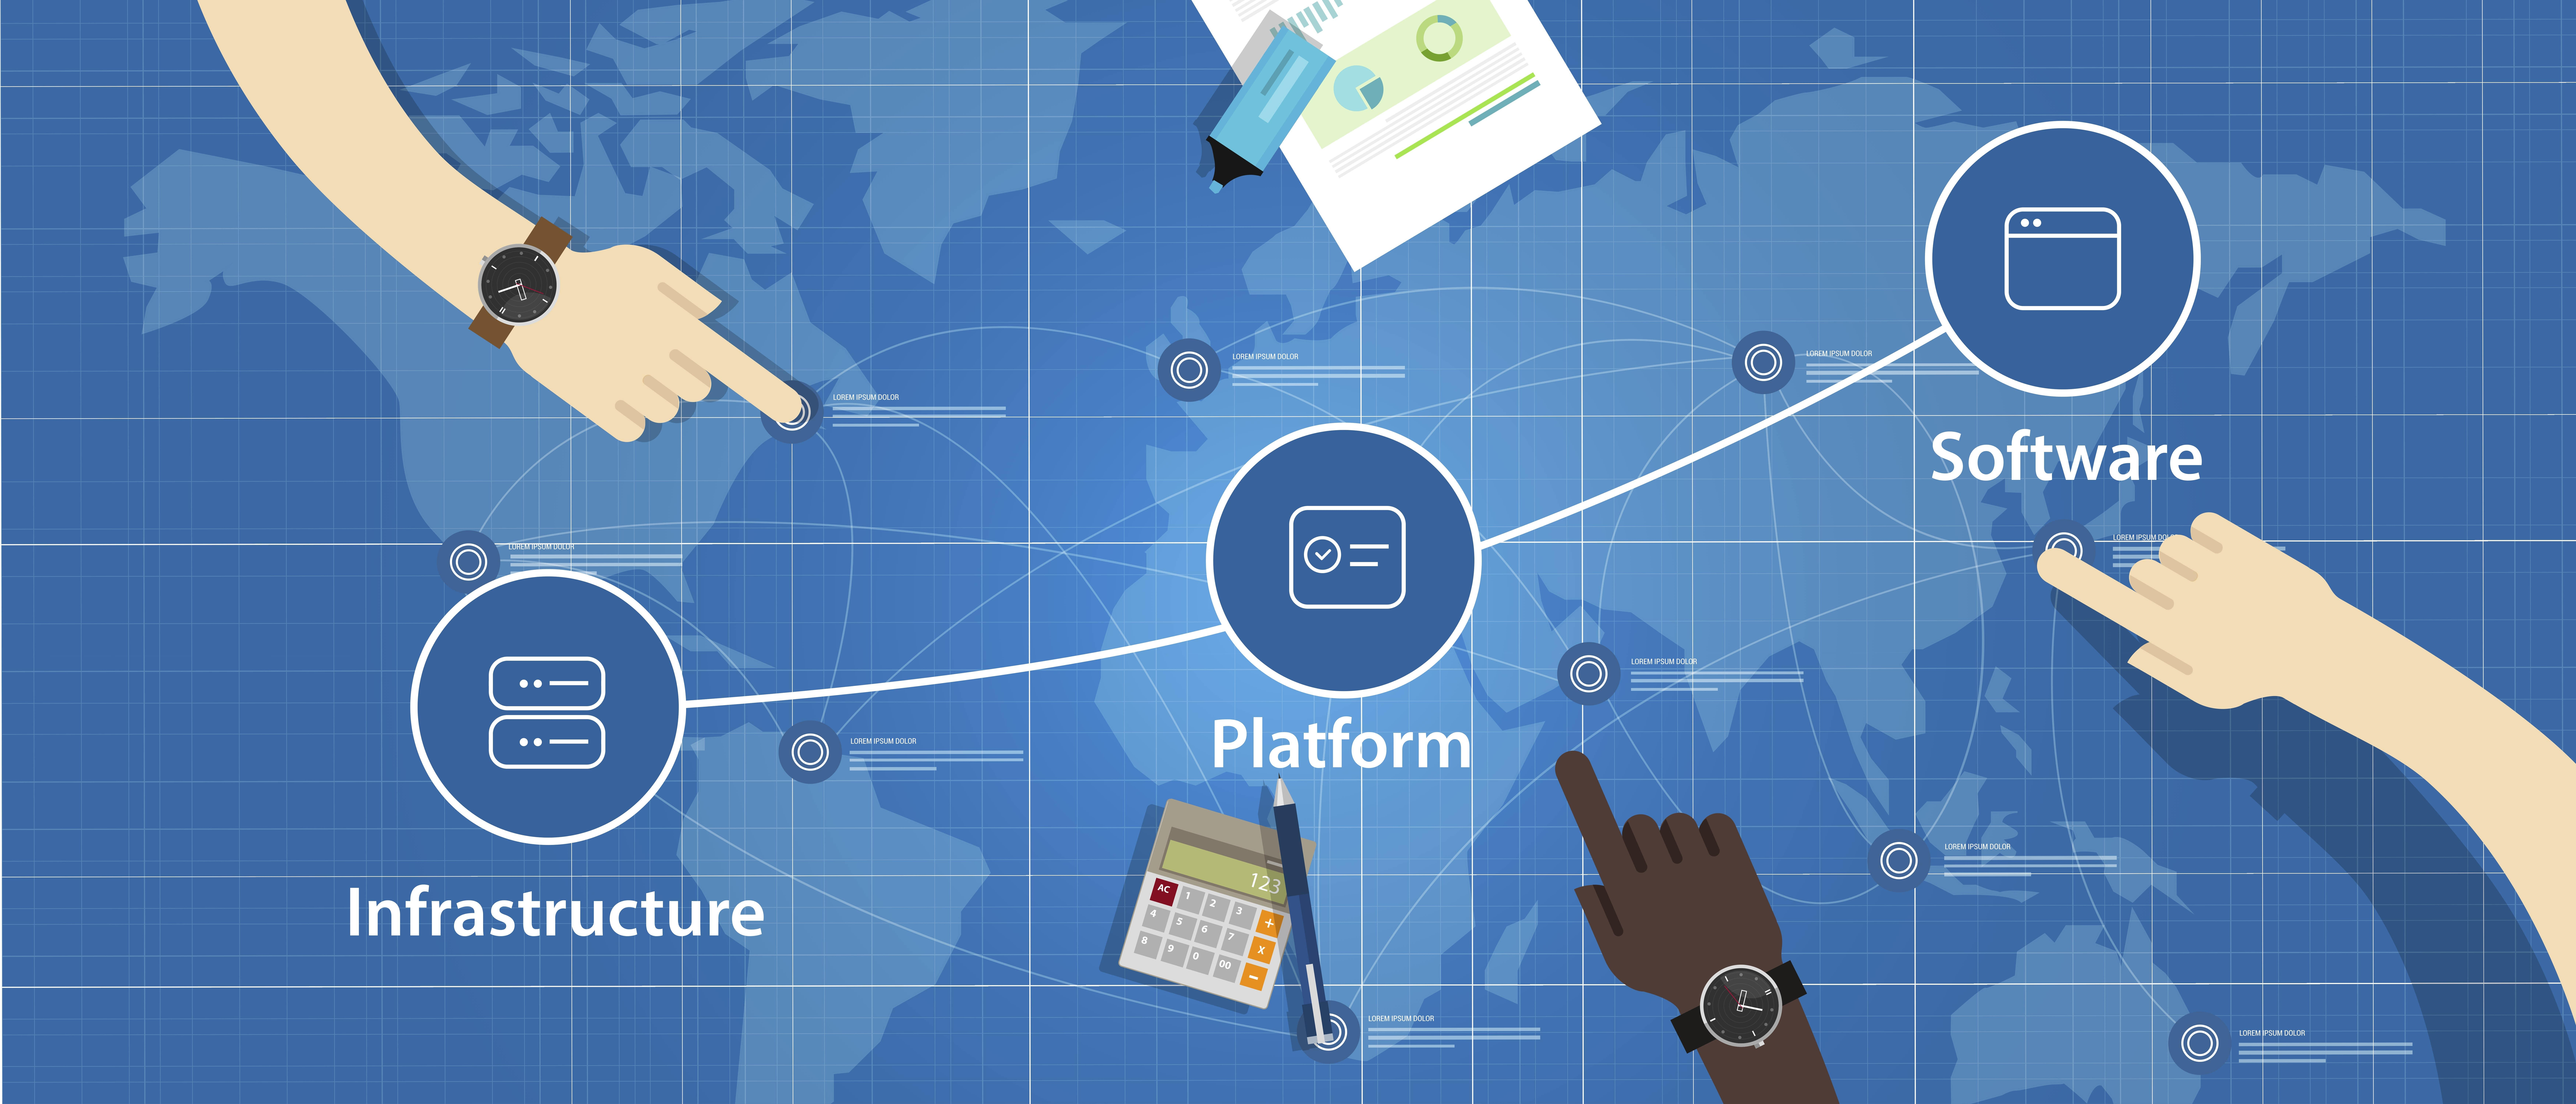 Platform, Software, Infrastructure